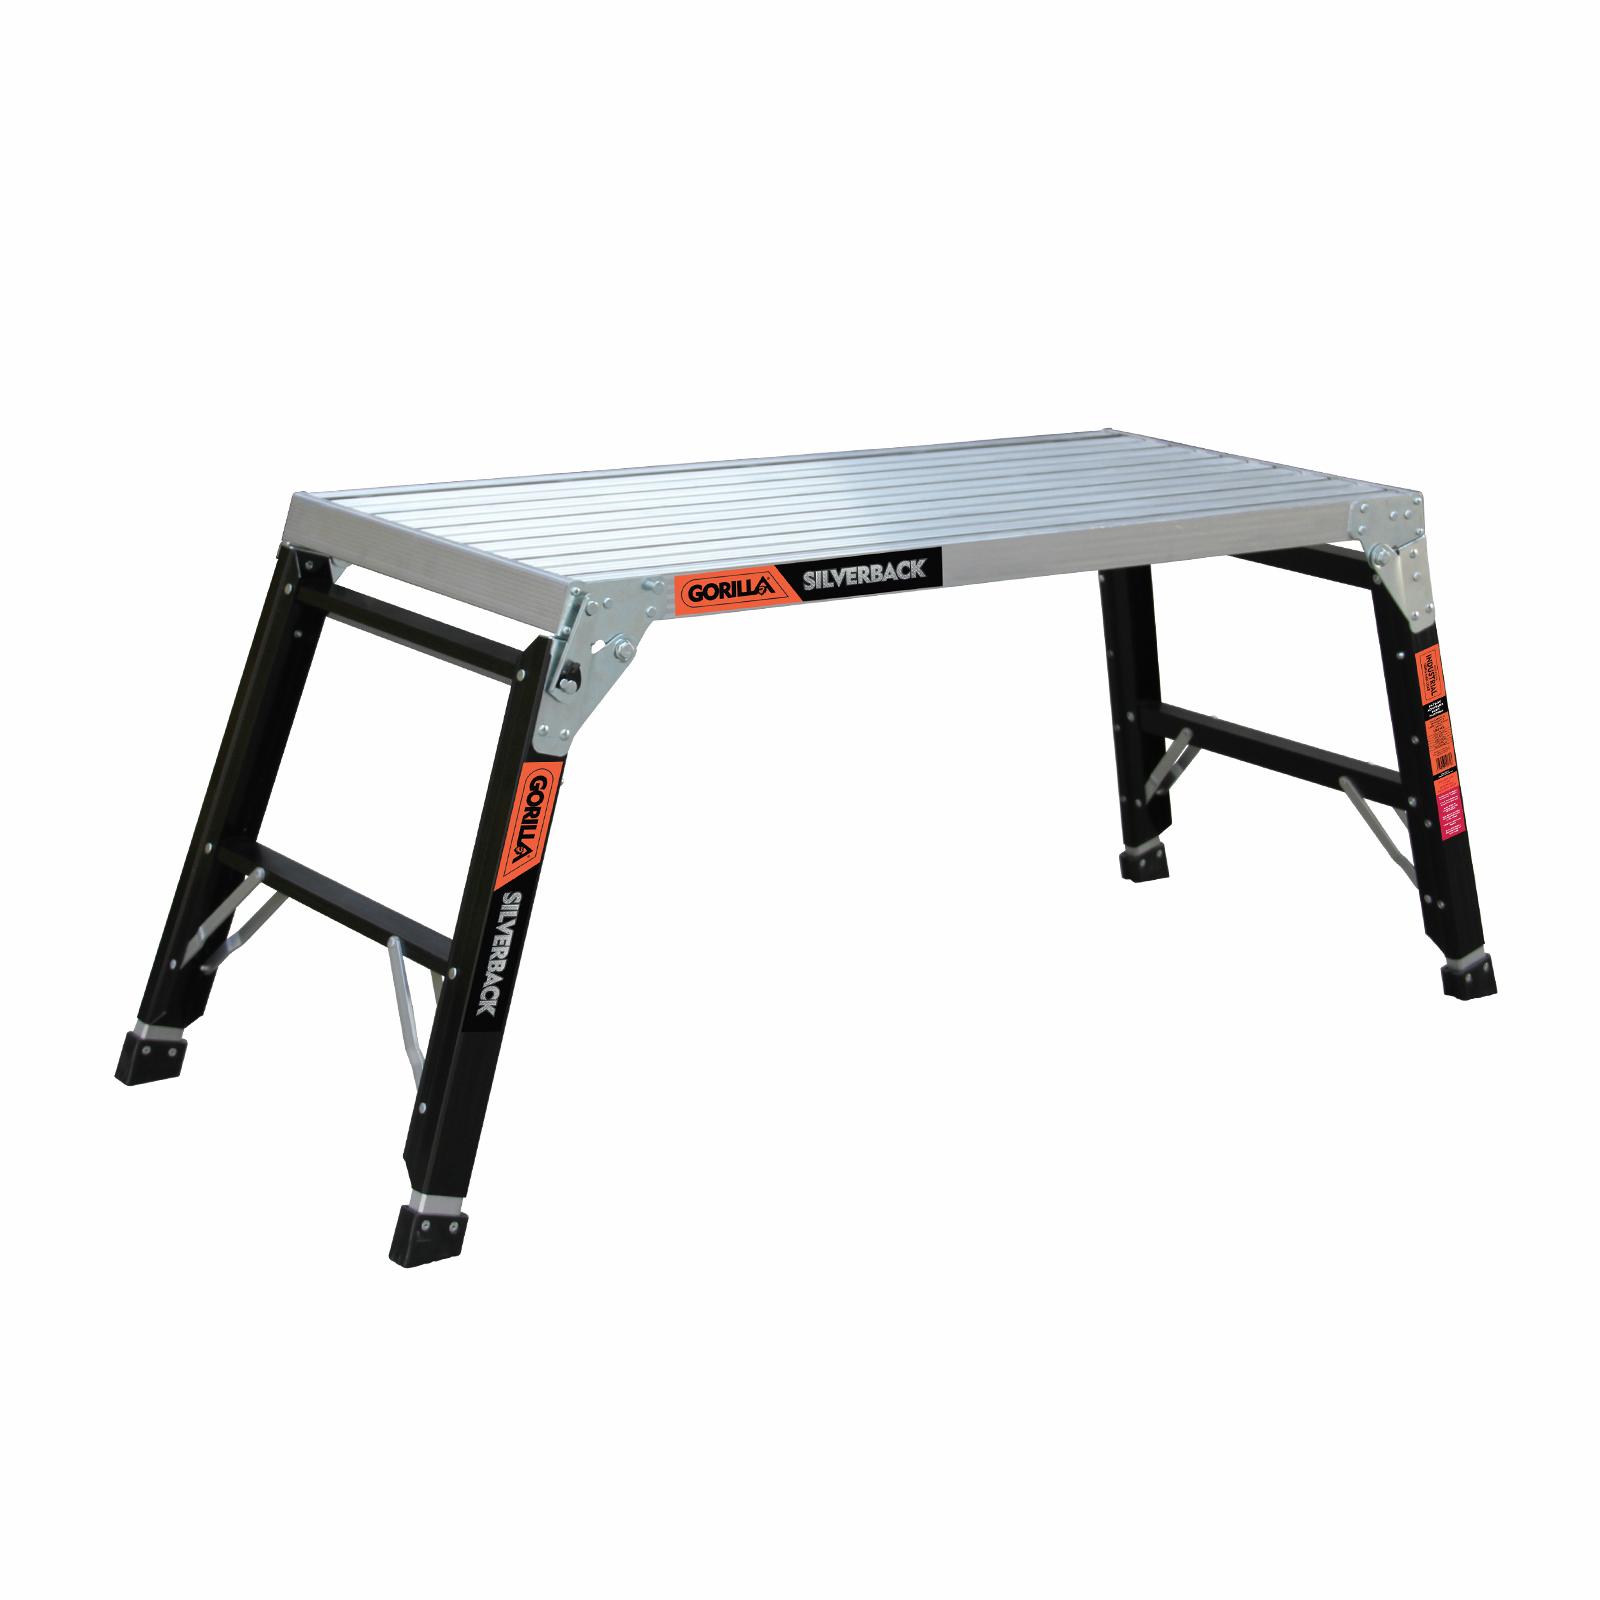 Gorilla 483mm Wide Silverback FATBOY Adjustable Paint Platform